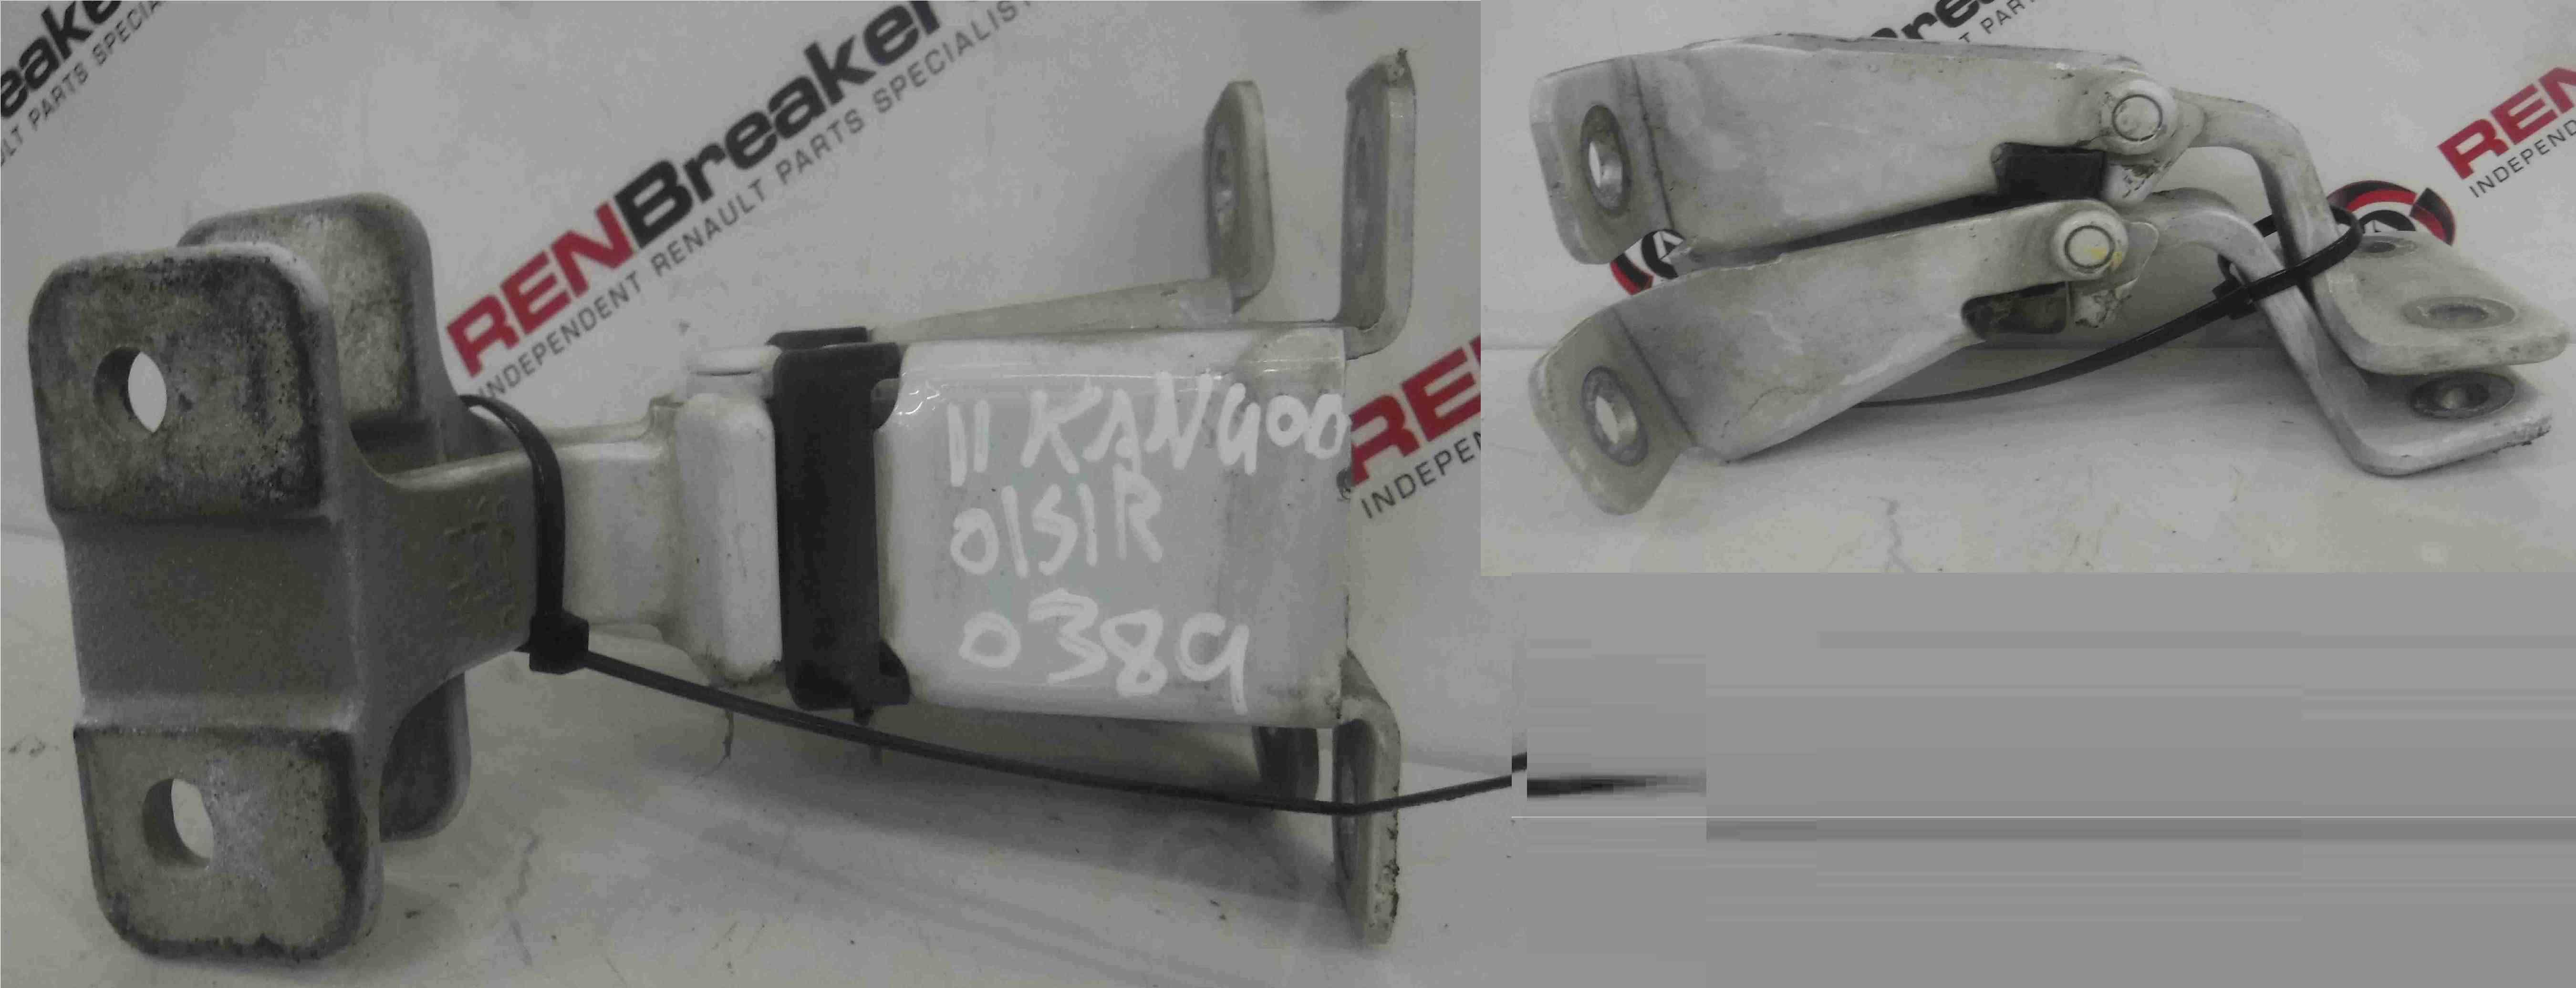 Renault Kangoo 2007-2017 Drivers OSR Rear Door Hinges Pair White O389 117113602D